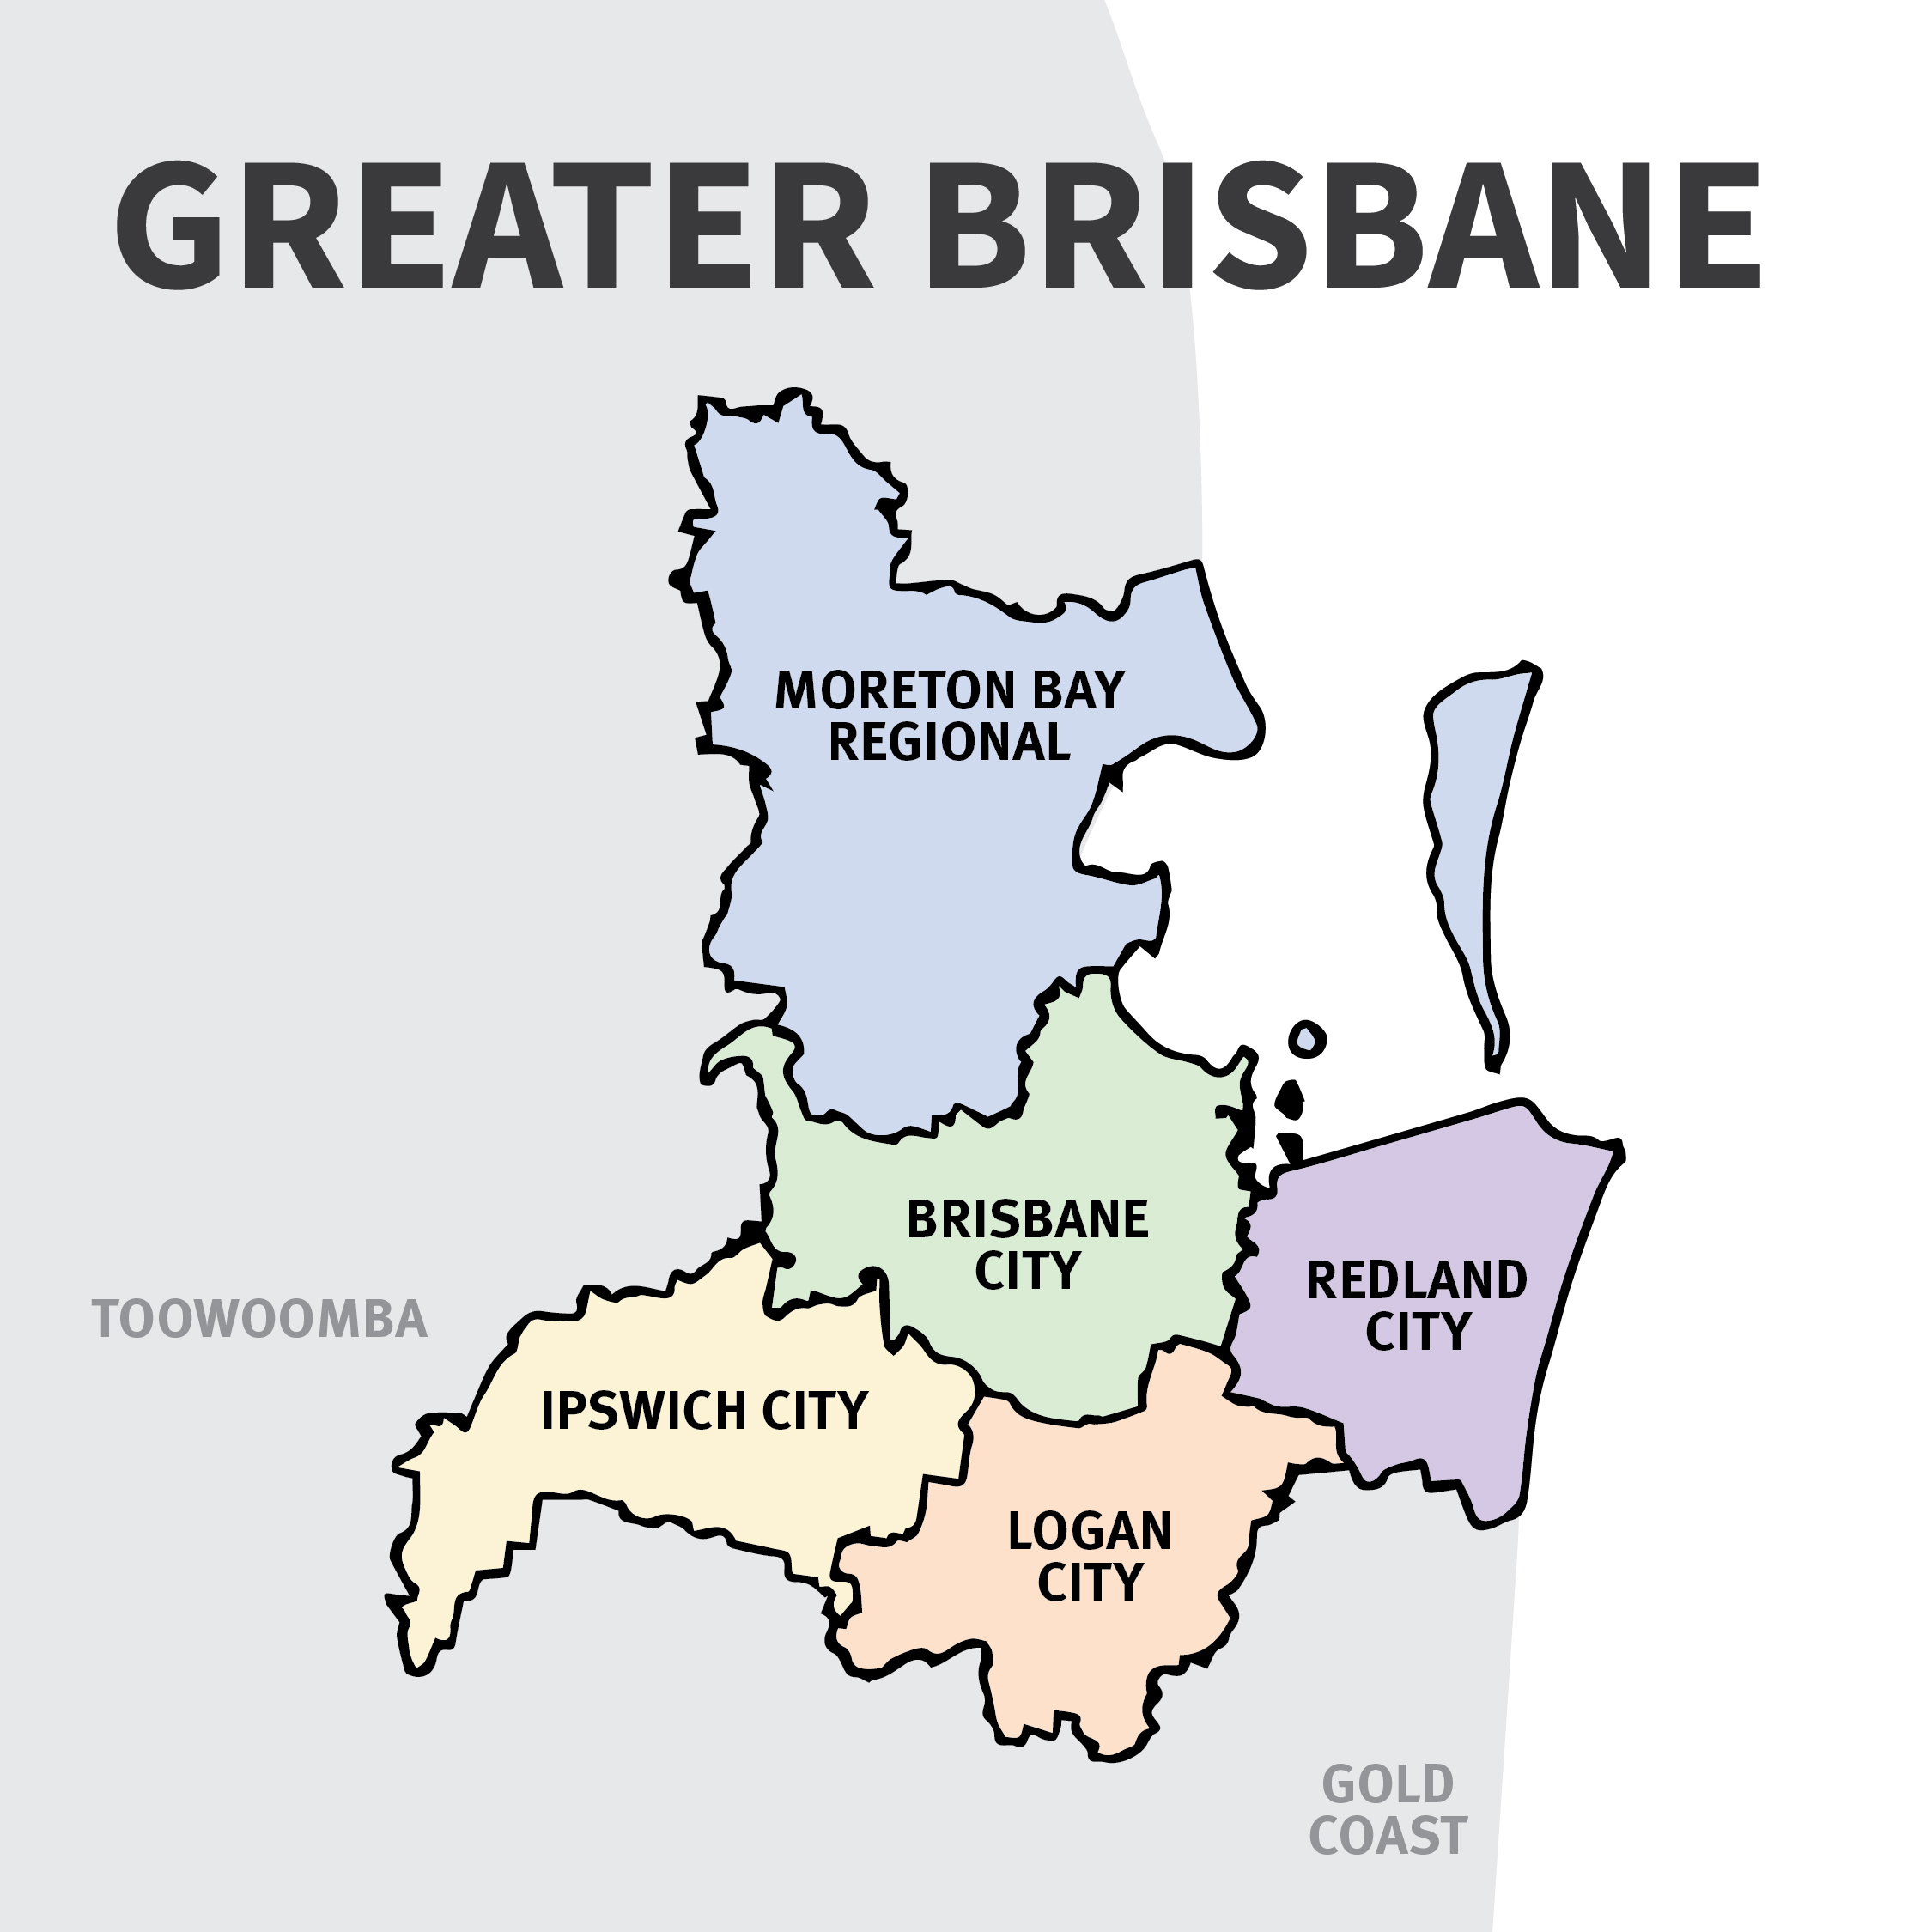 greater-brisbane.jpg